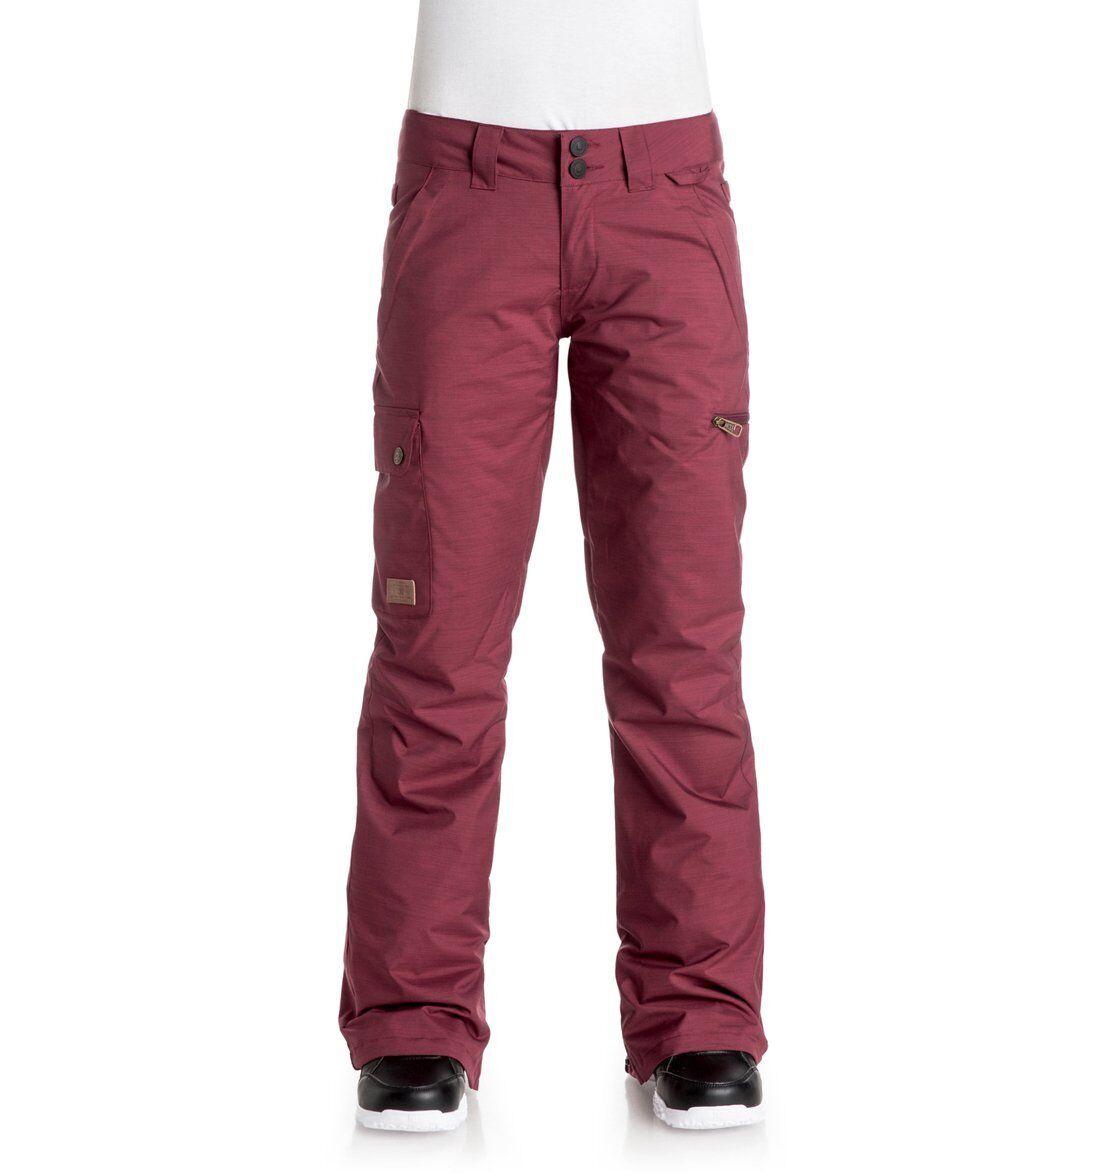 DC Women's RECRUIT Snow Pants - RRT0 - XL - NWT